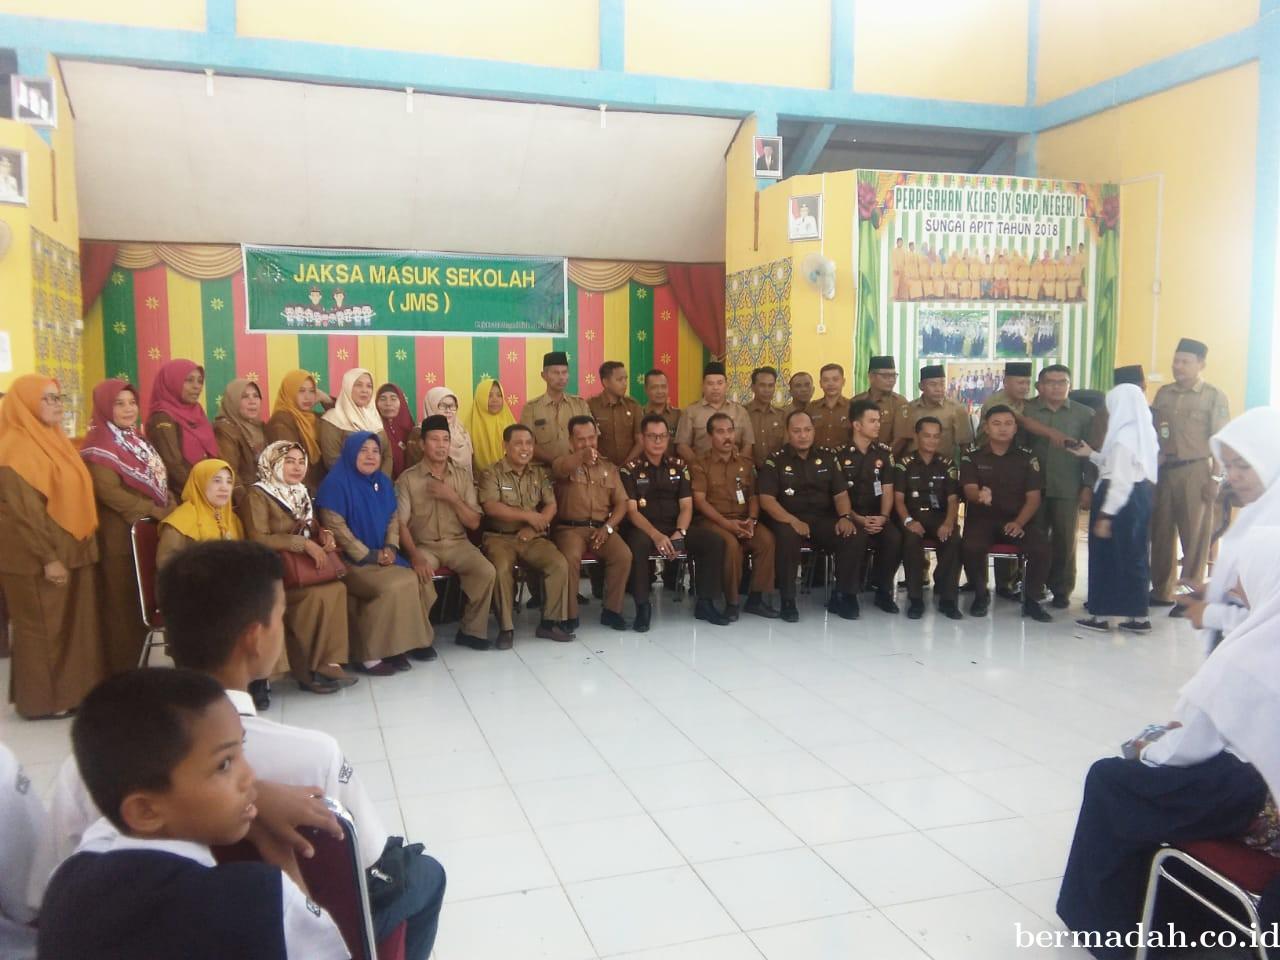 Program Jaksa Masuk Sekolah Oleh Tim JMS di SMP Negeri I Sungai Apit